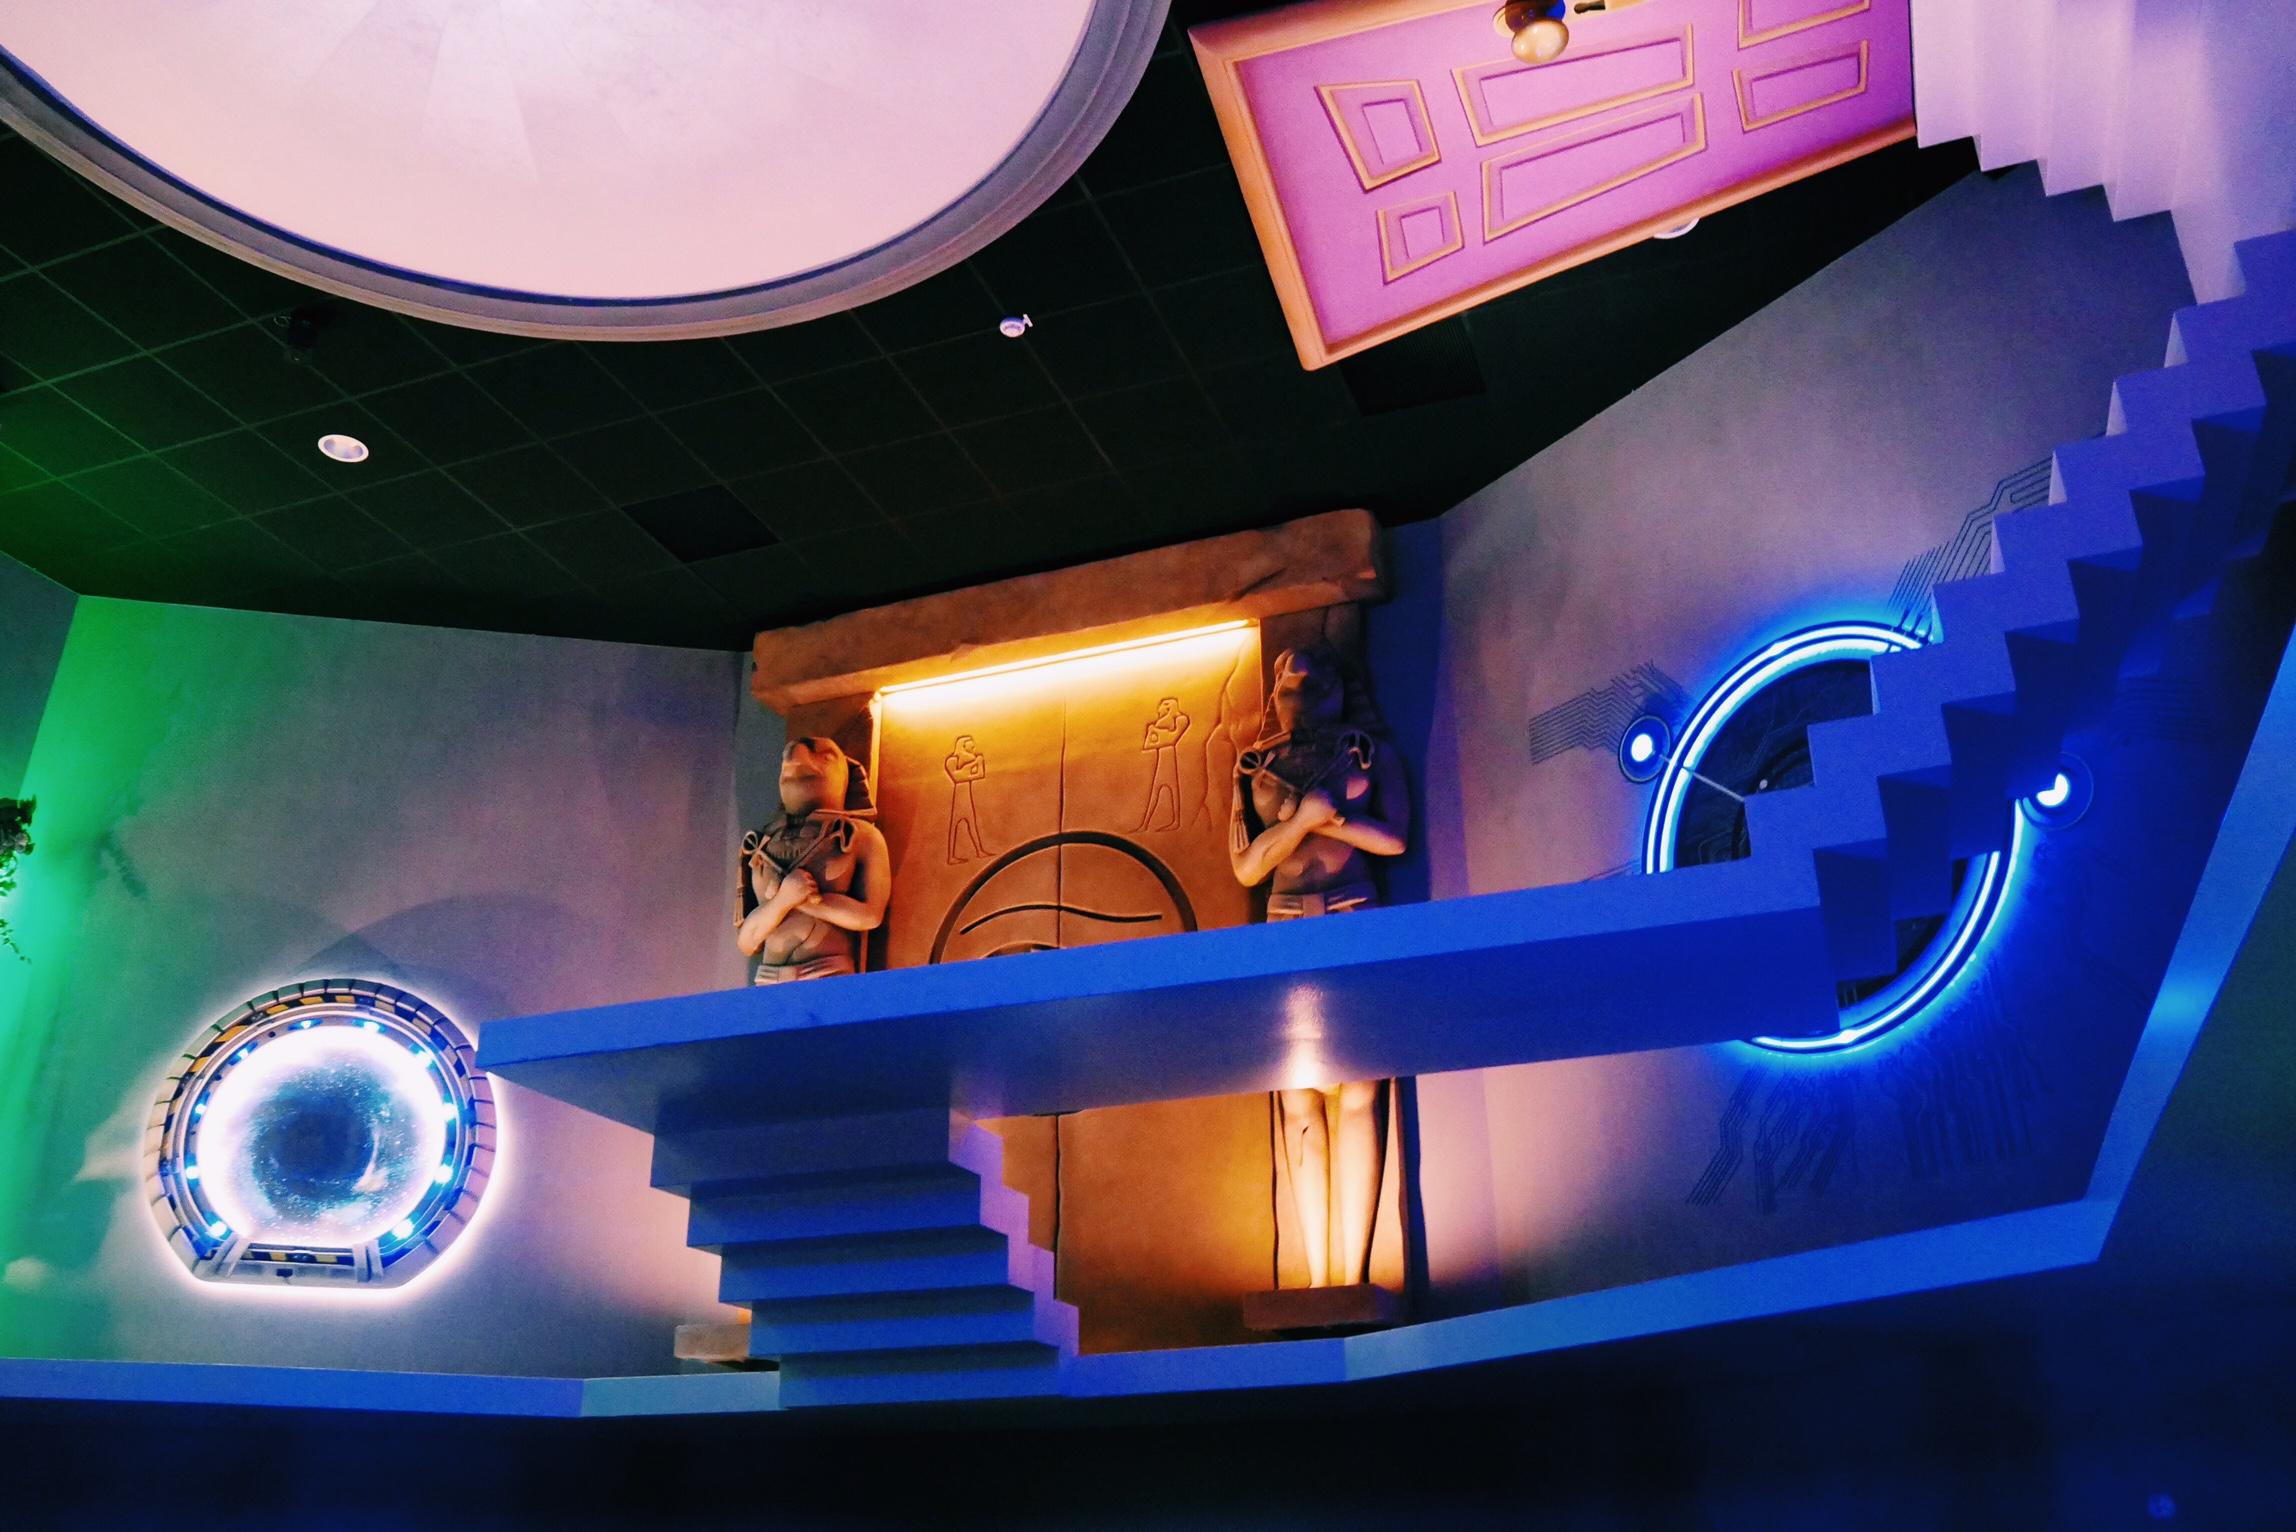 L-Extraordinaire-Voyage-Futuroscope-décor-porte-temple-Egypte-photo-usofparis-blog